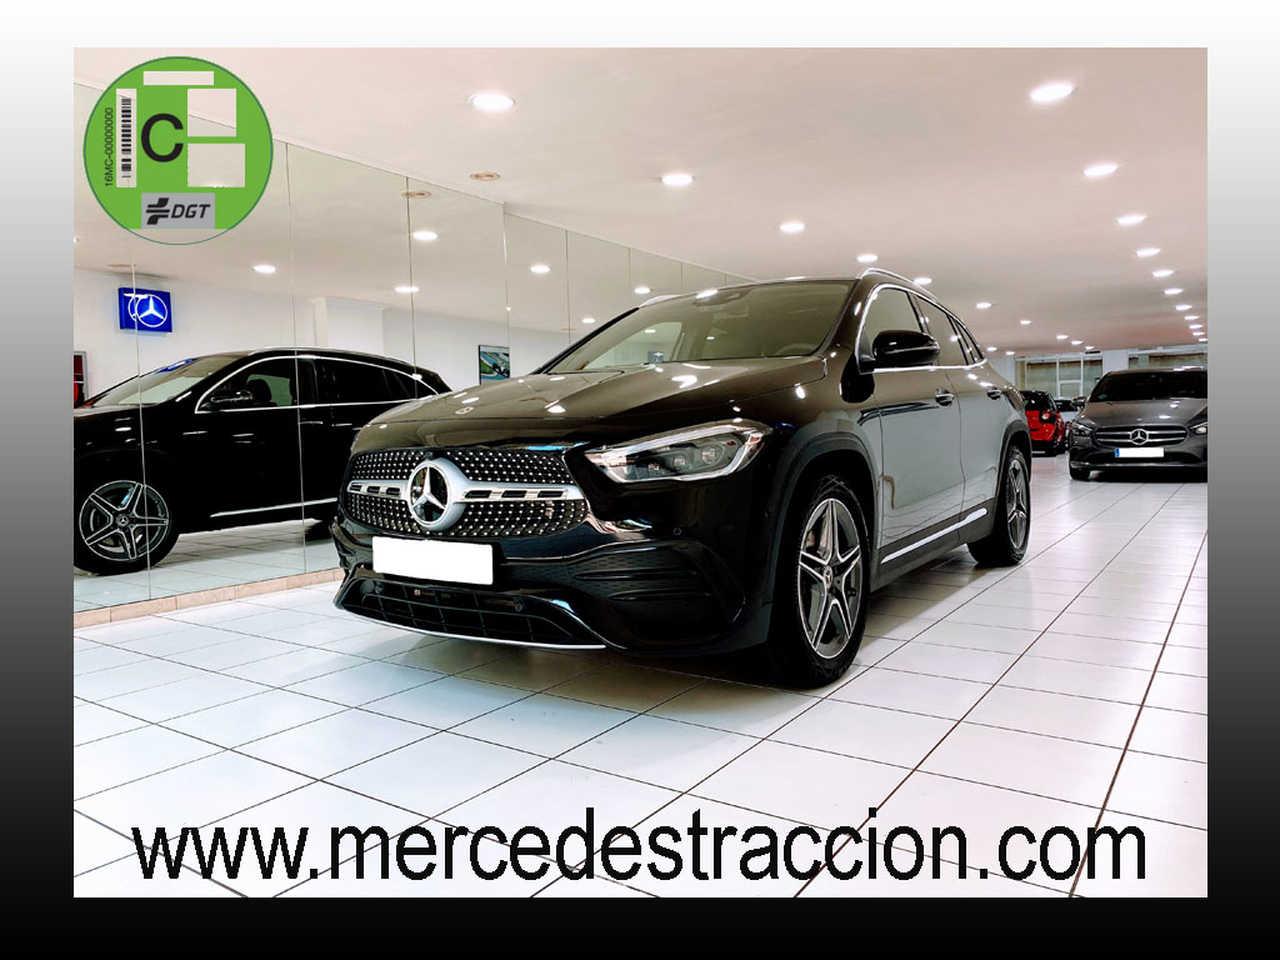 Mercedes GLA 220 d 4 Matic/AMG Line/8 G/Navegación/Parktronic/Km 0   - Foto 1